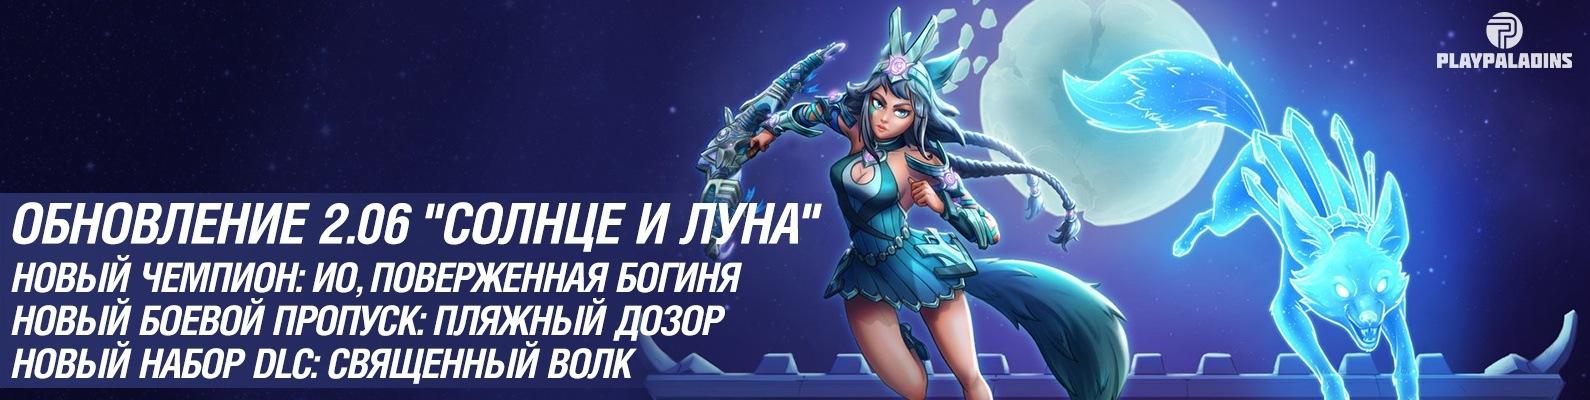 Paladins | ВКонтакте